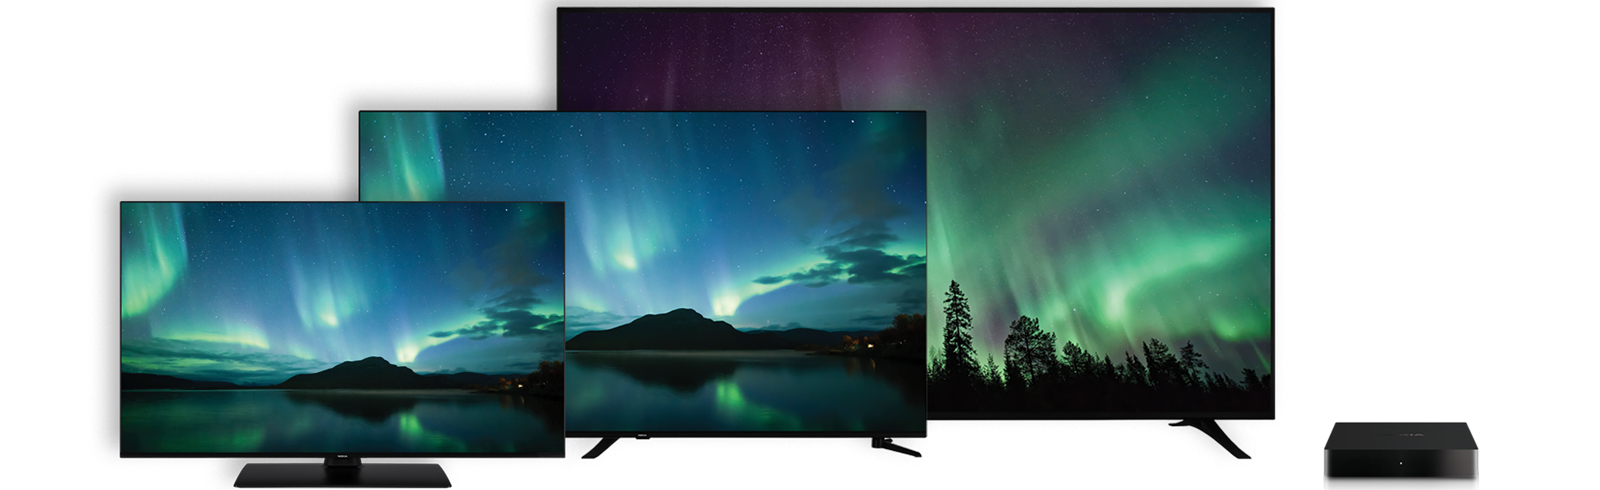 Nokia TVs are coming to Europe